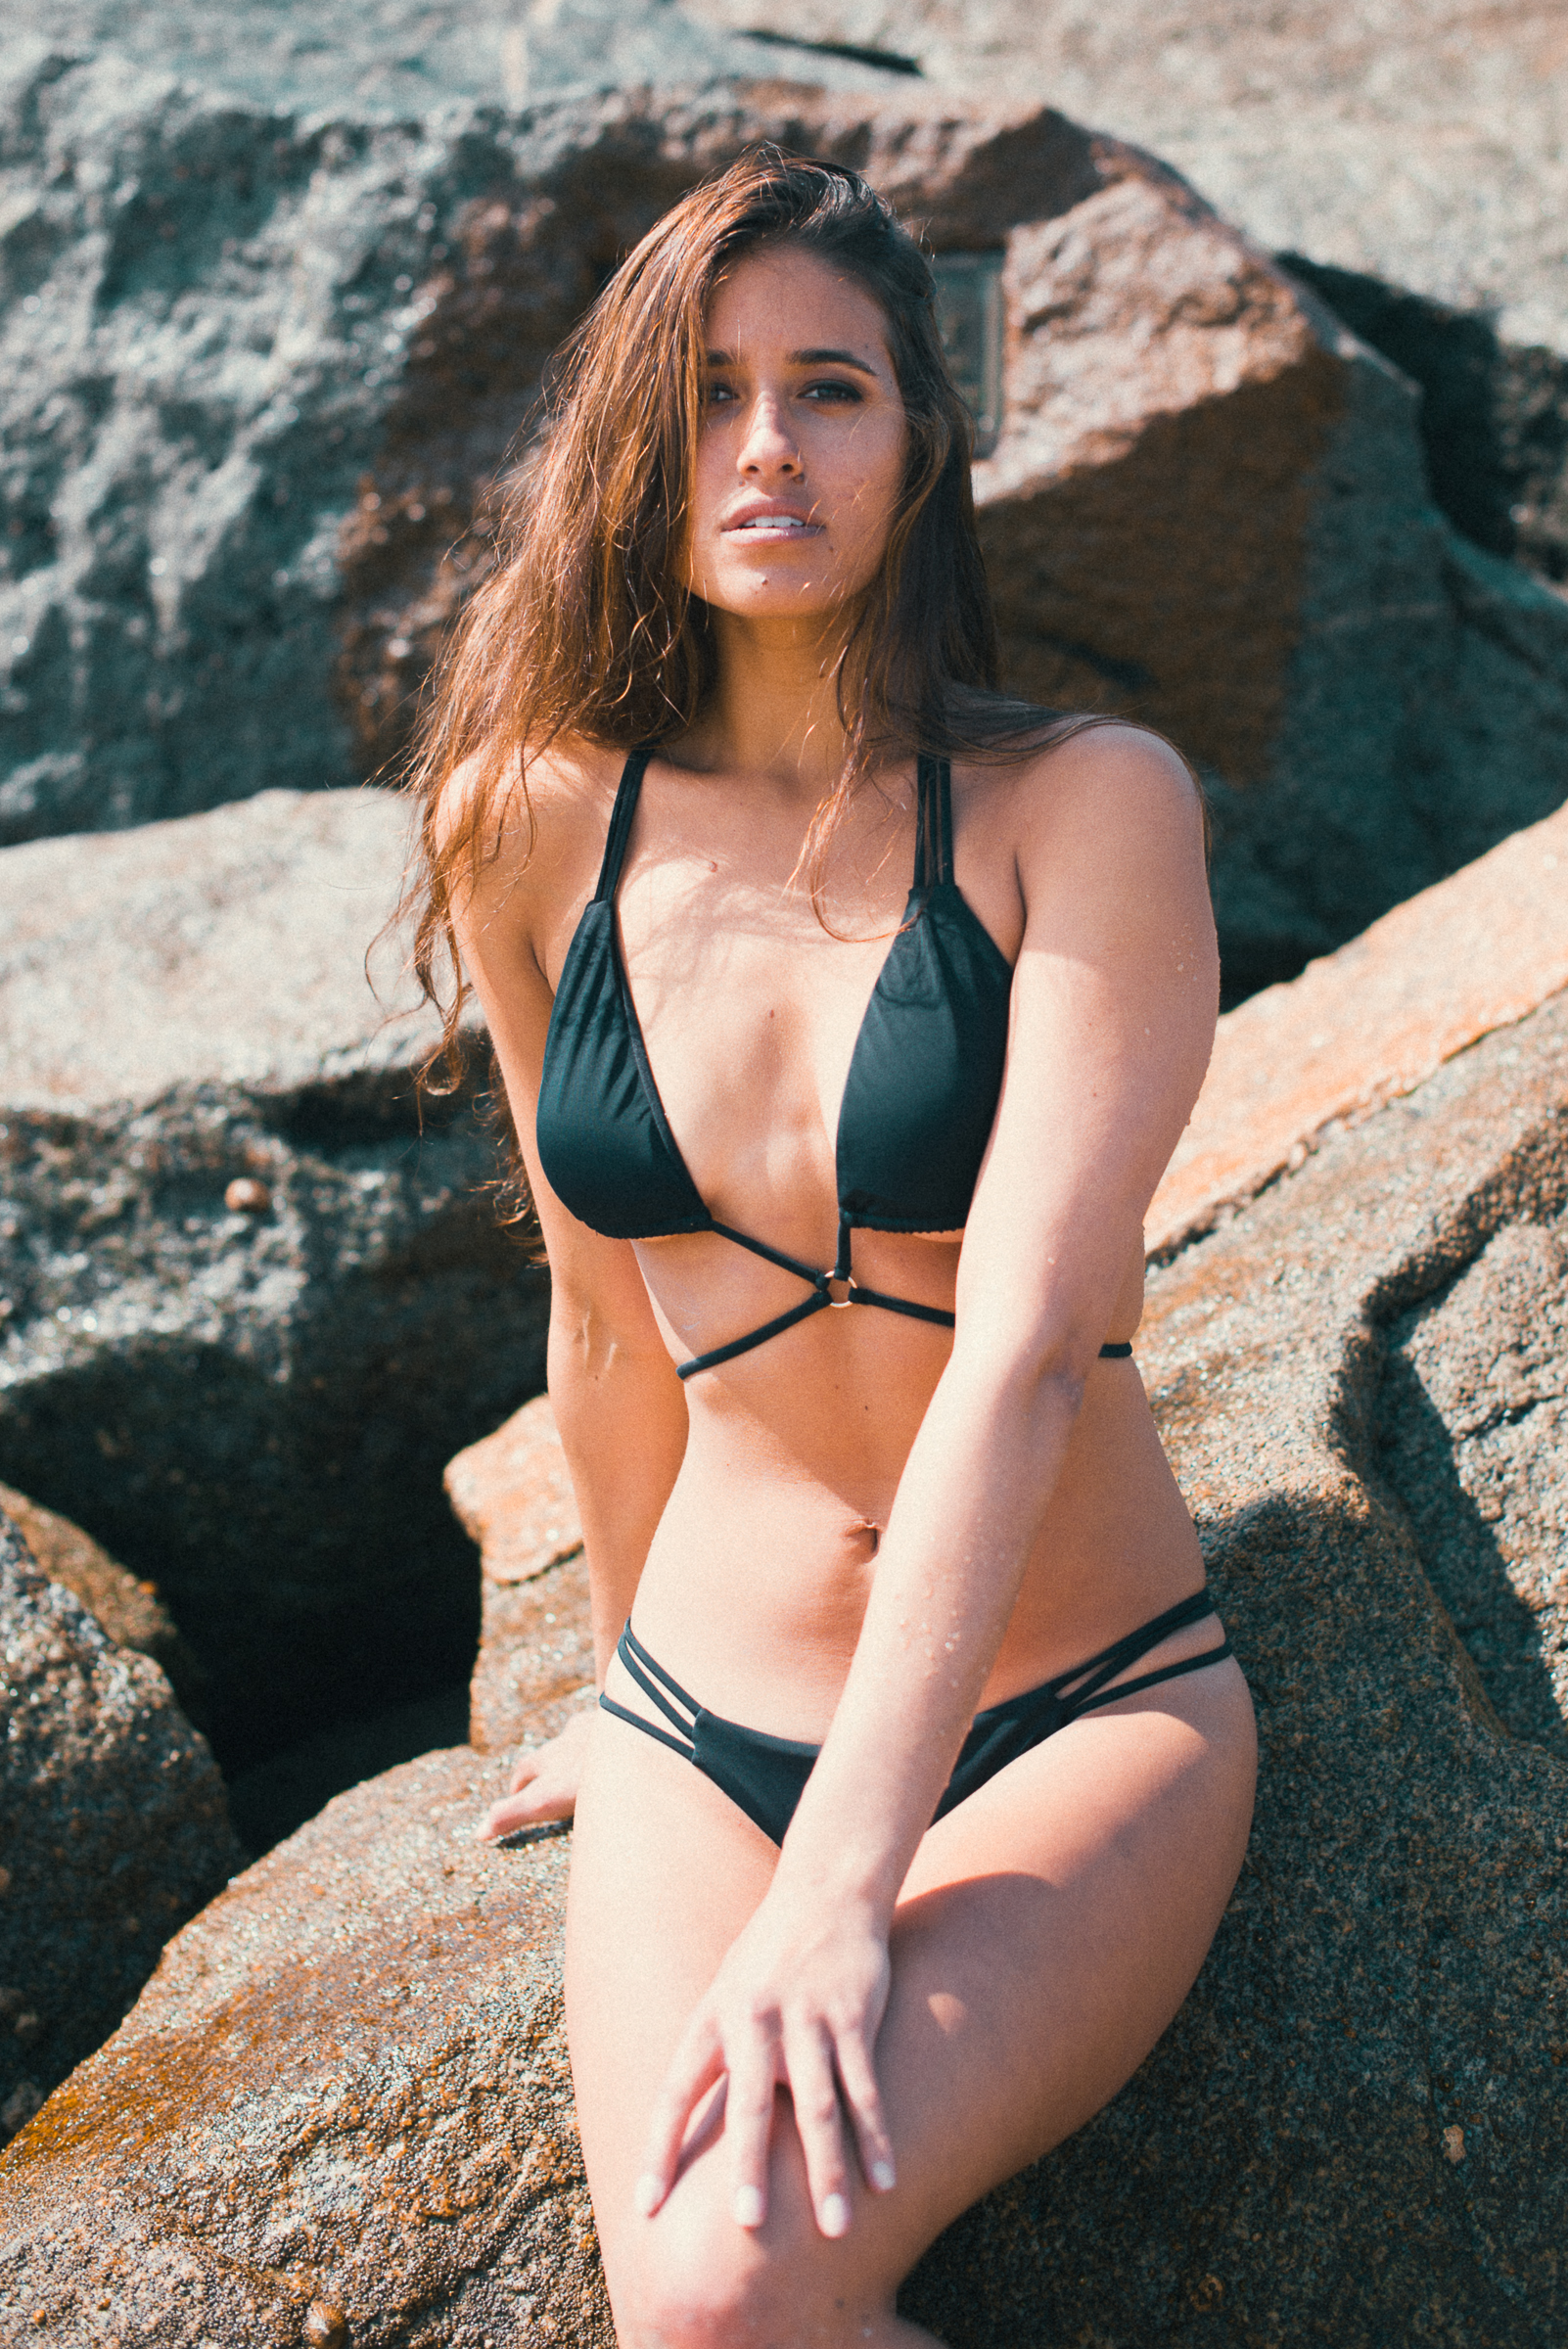 Megan-DSC_2124.jpg